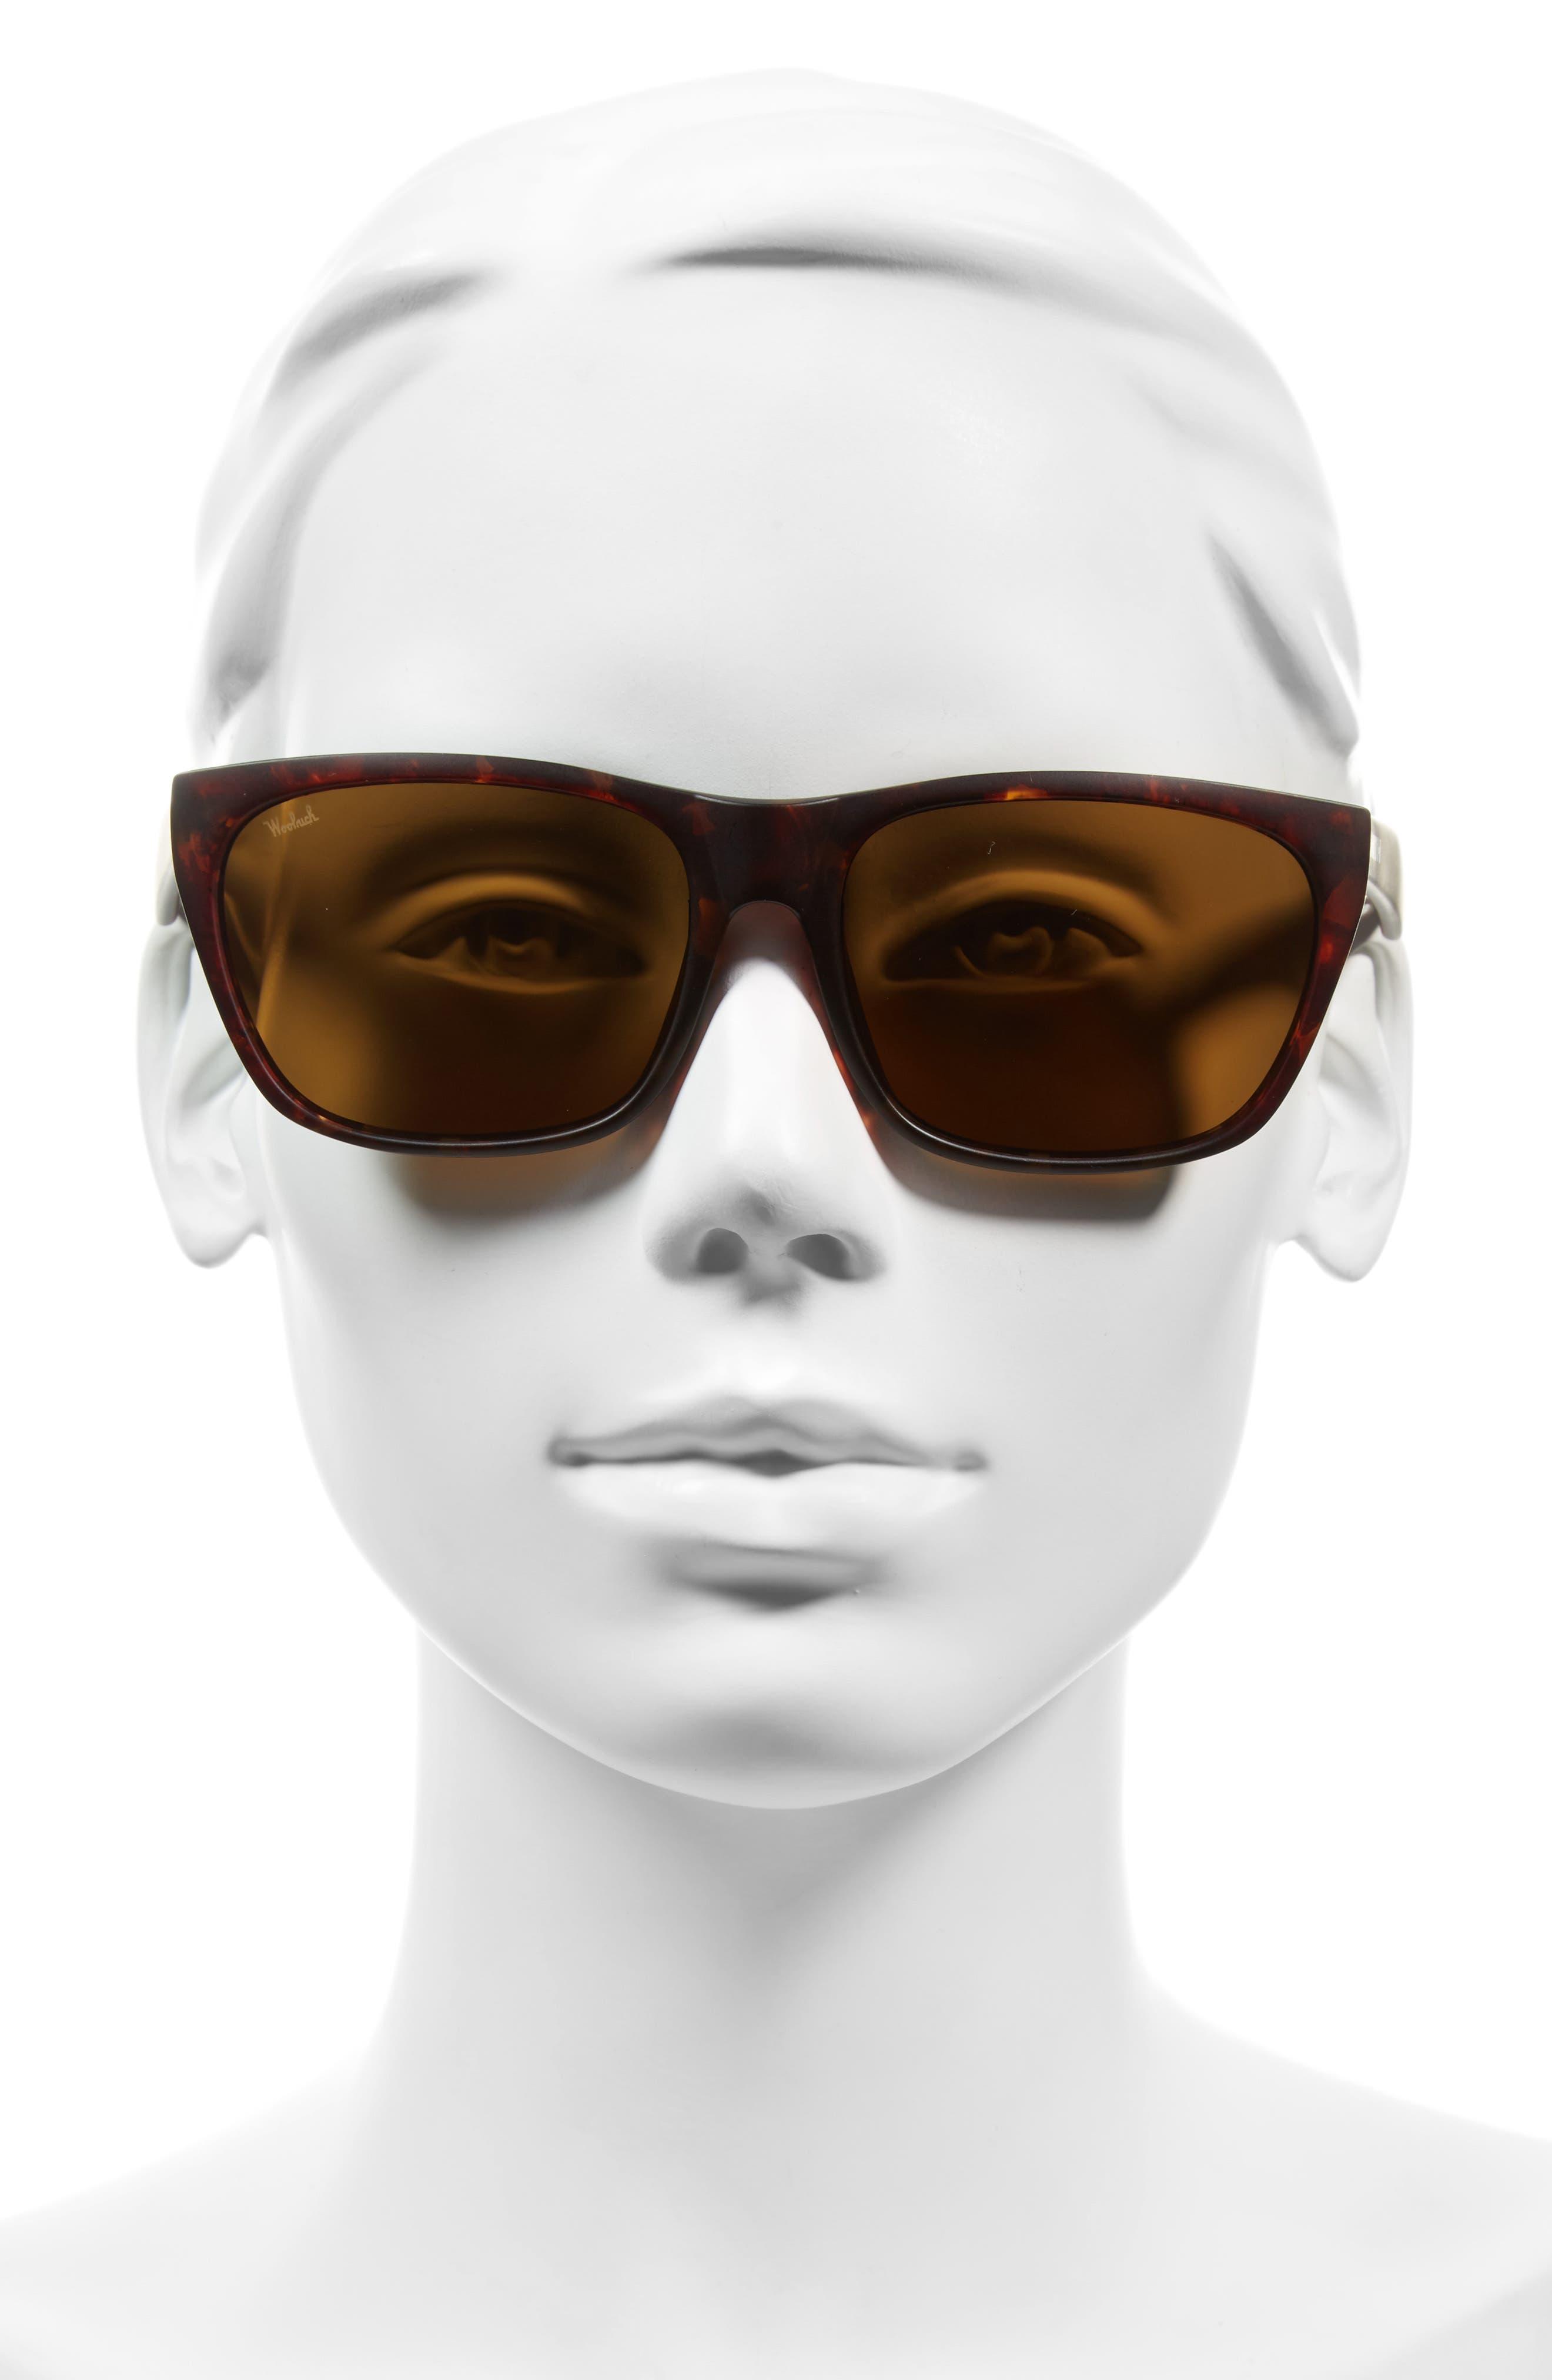 Tioga 57mm Polarized Sunglasses,                             Alternate thumbnail 2, color,                             Vintage Havana Matte